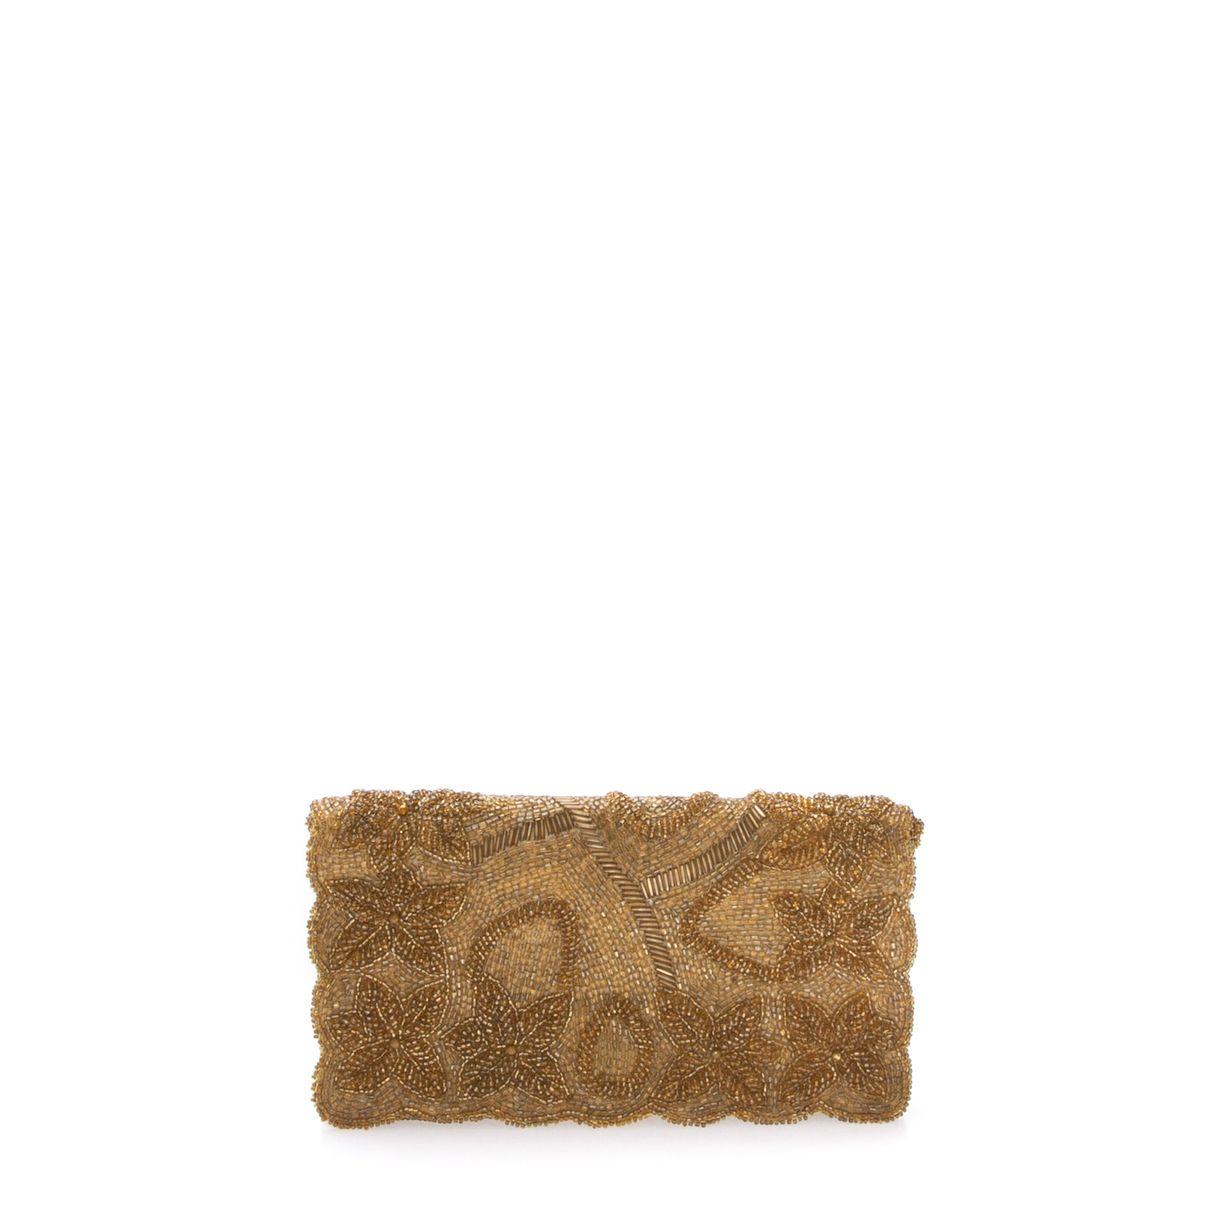 Bolsa-Vintage-Micangas-Dourada